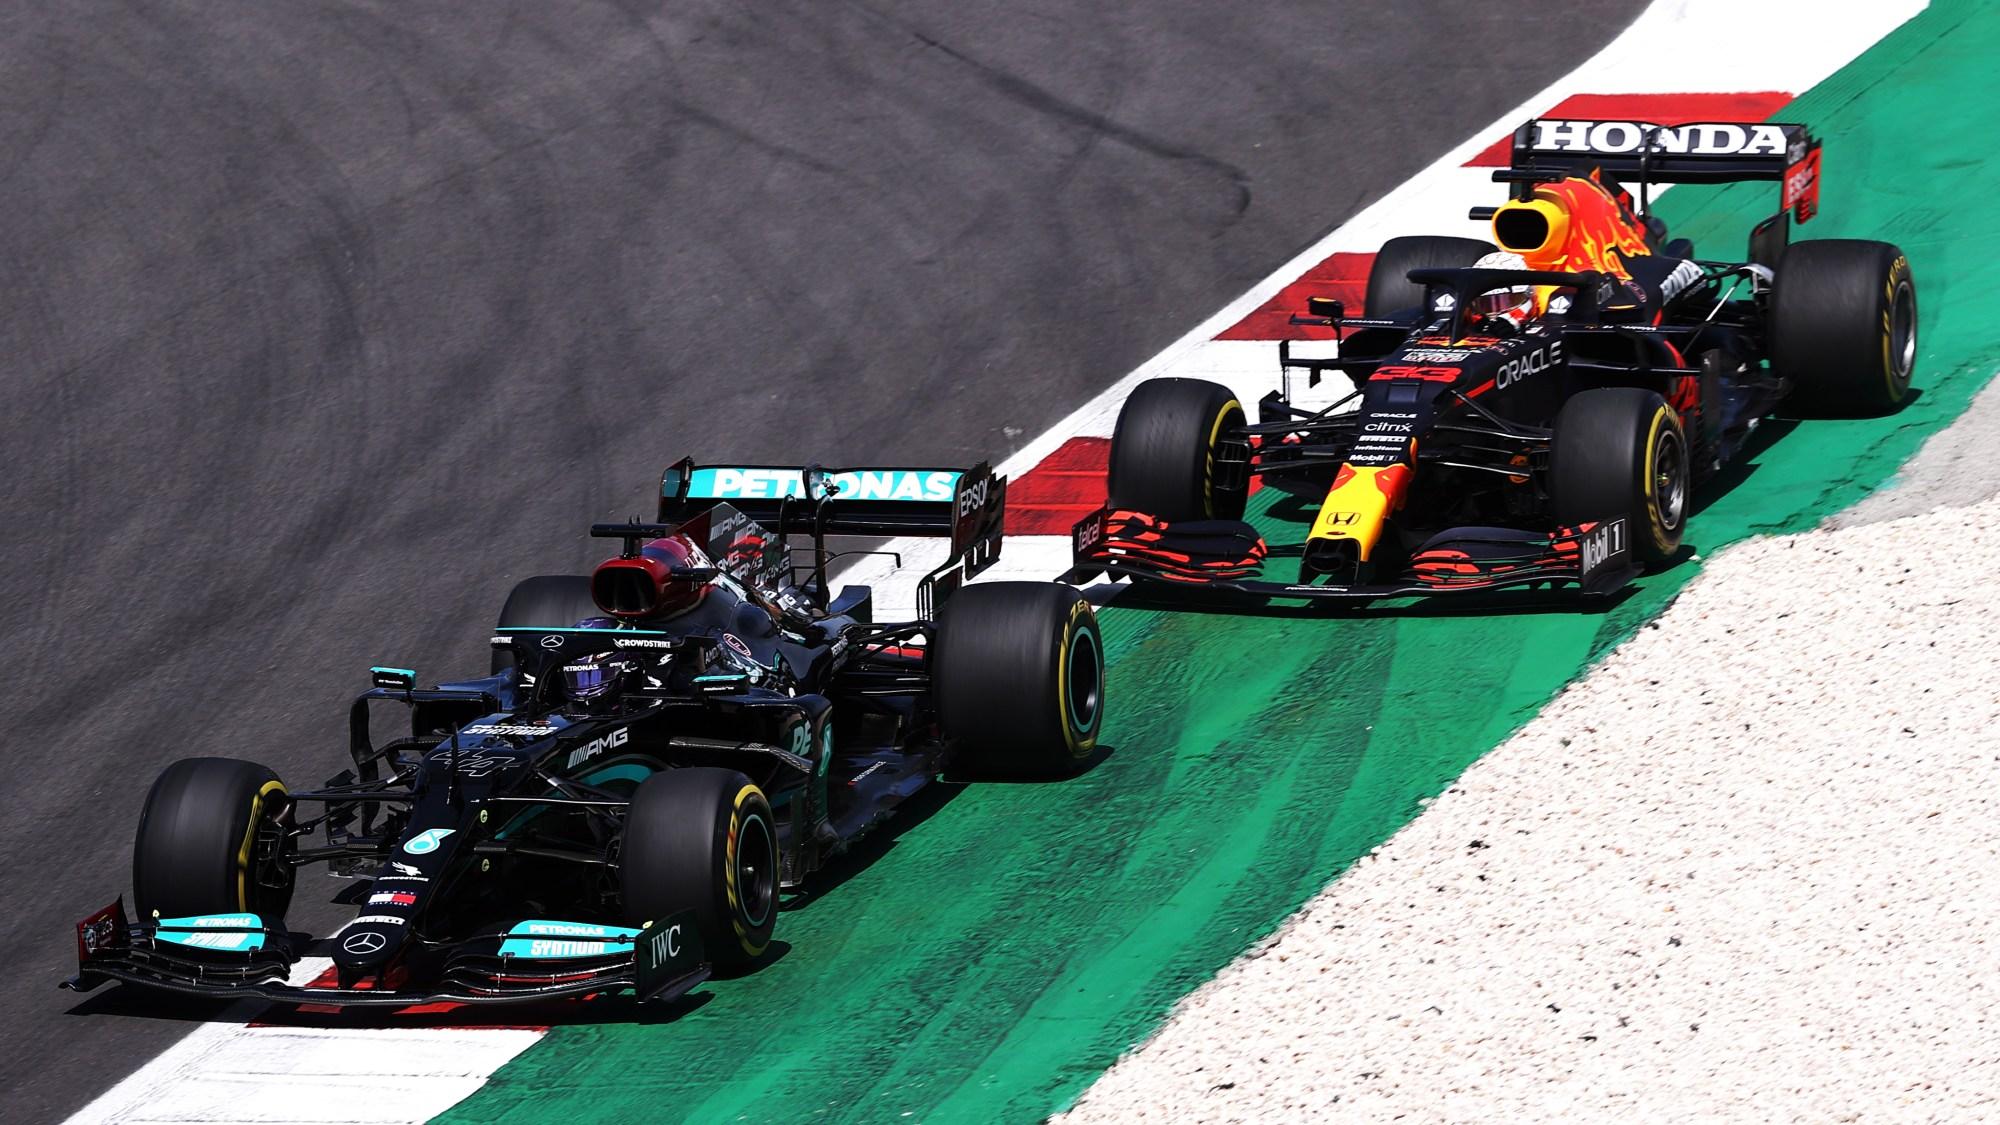 Lewis Hamilton, Max Verstappen, 2021 Portugueuse Grand Prix